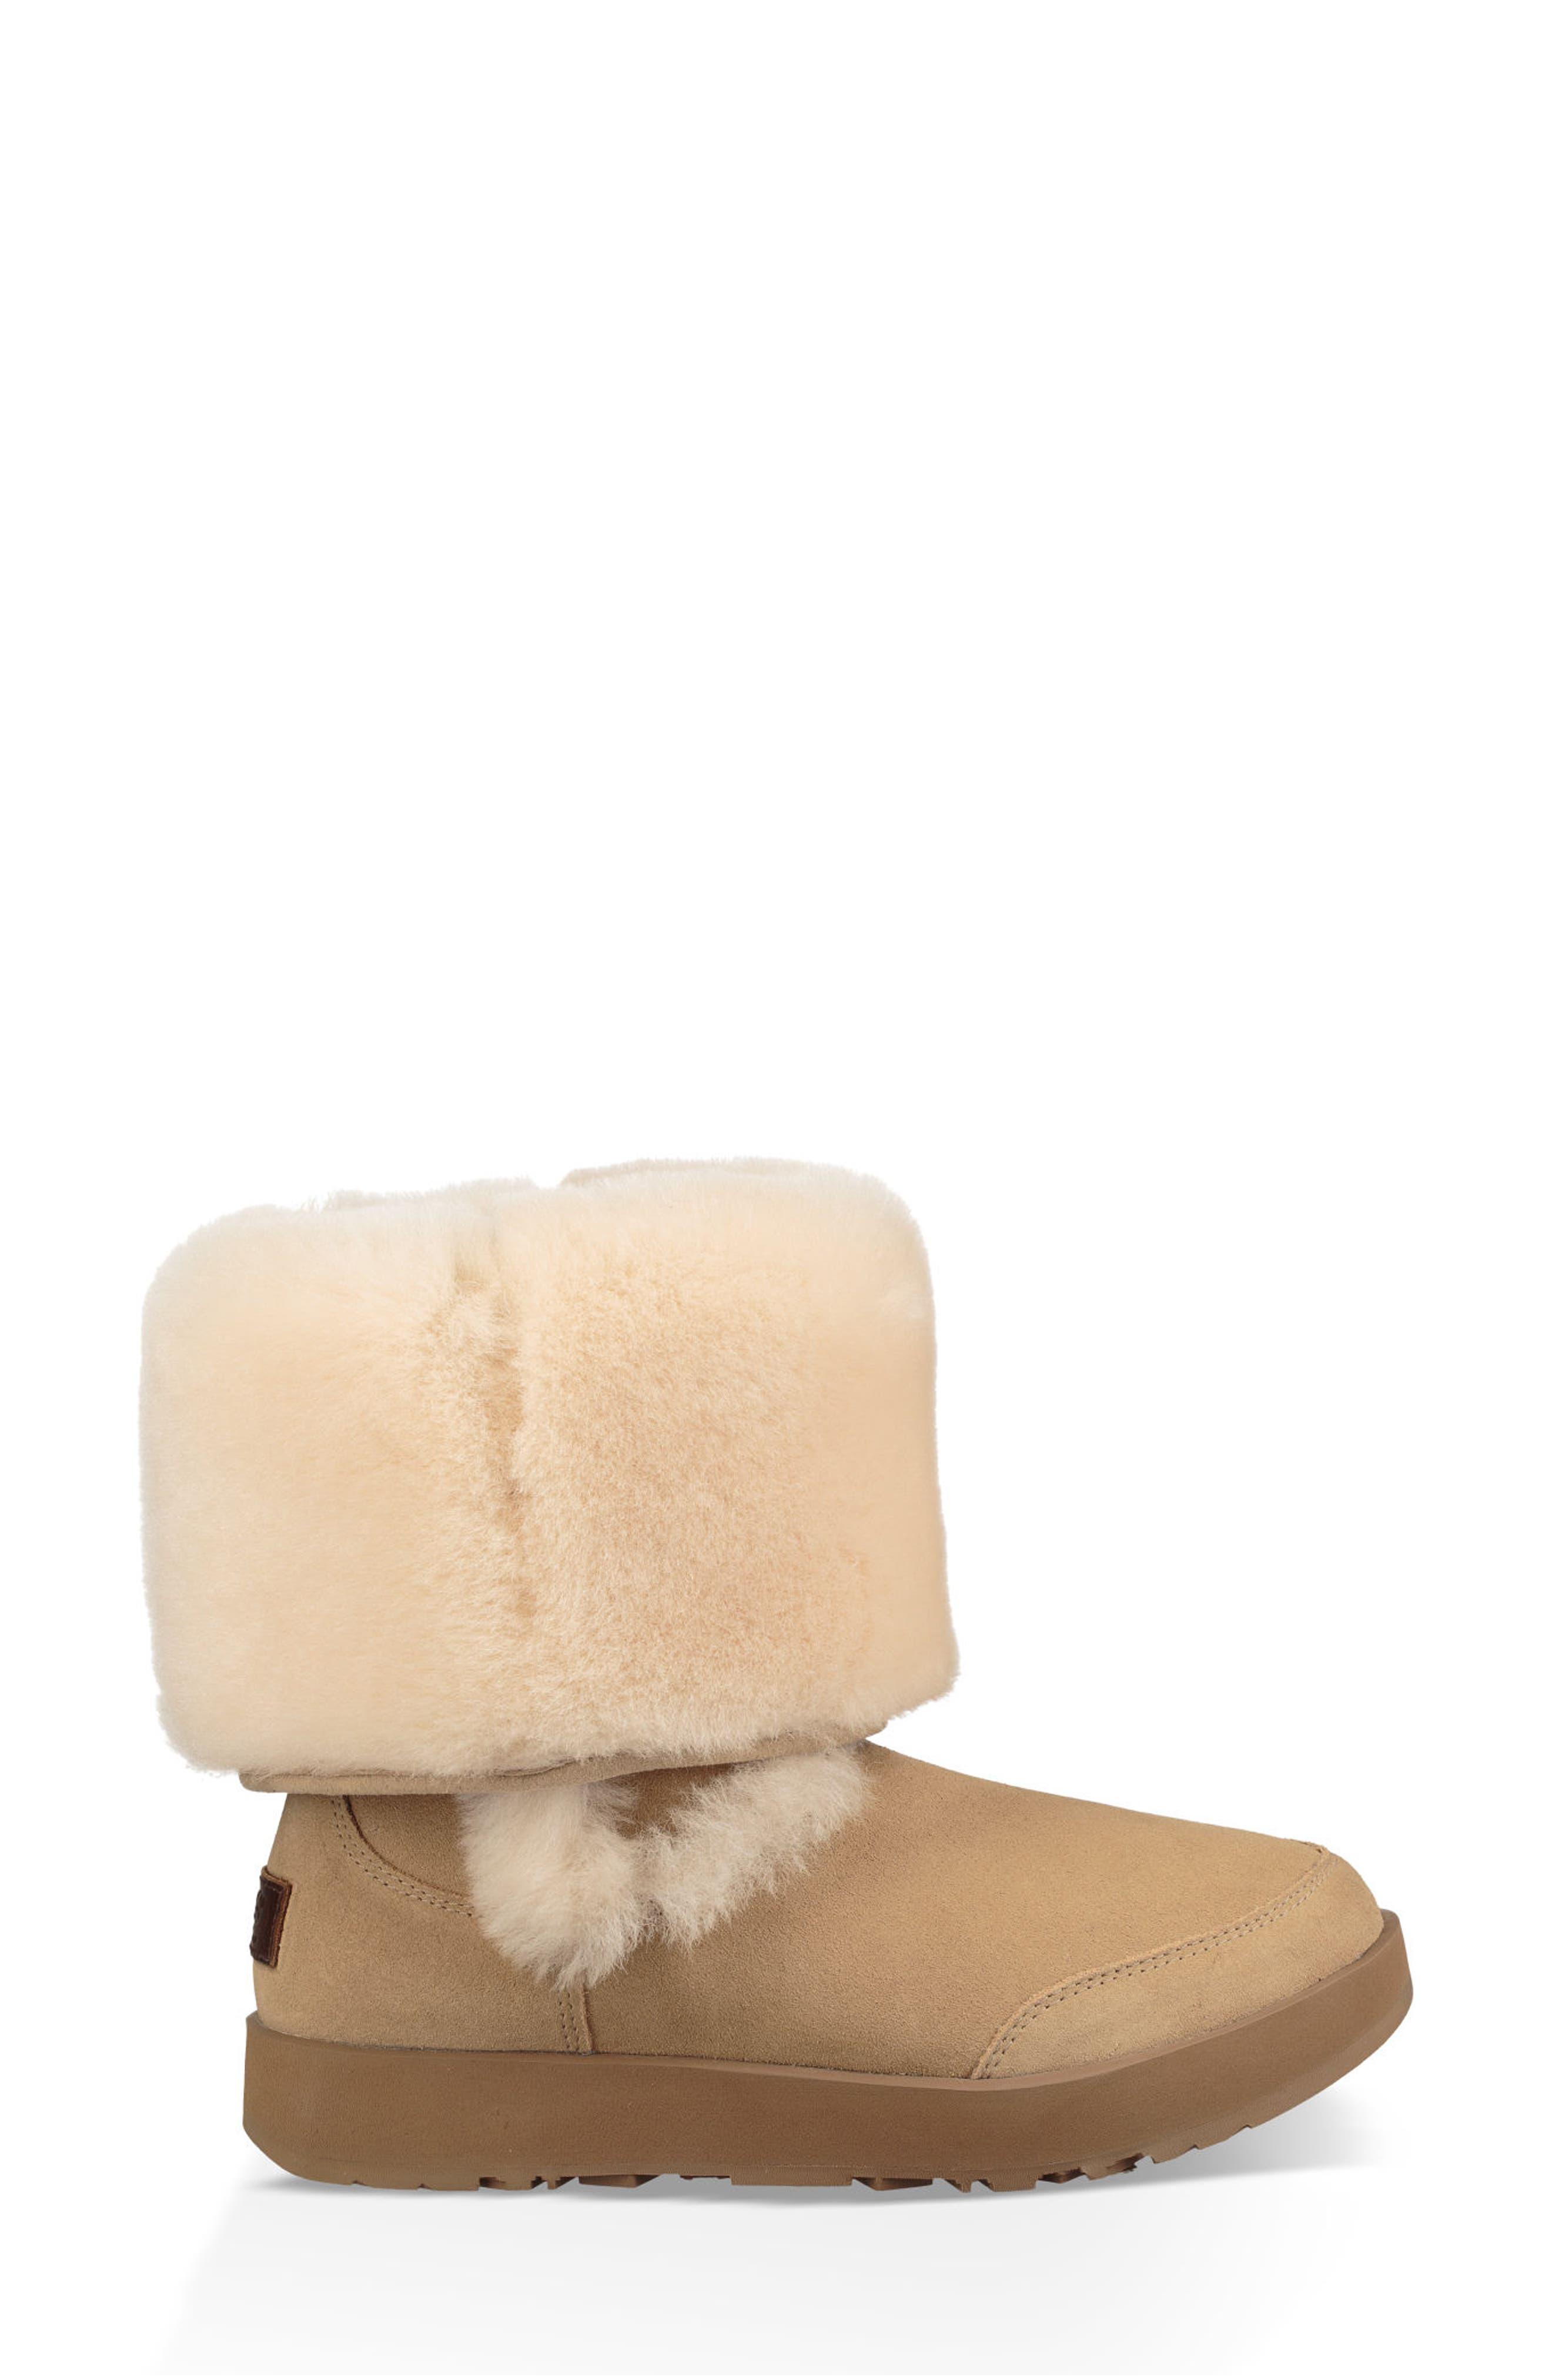 Sundance Genuine Shearling Waterproof Boot,                             Alternate thumbnail 9, color,                             251